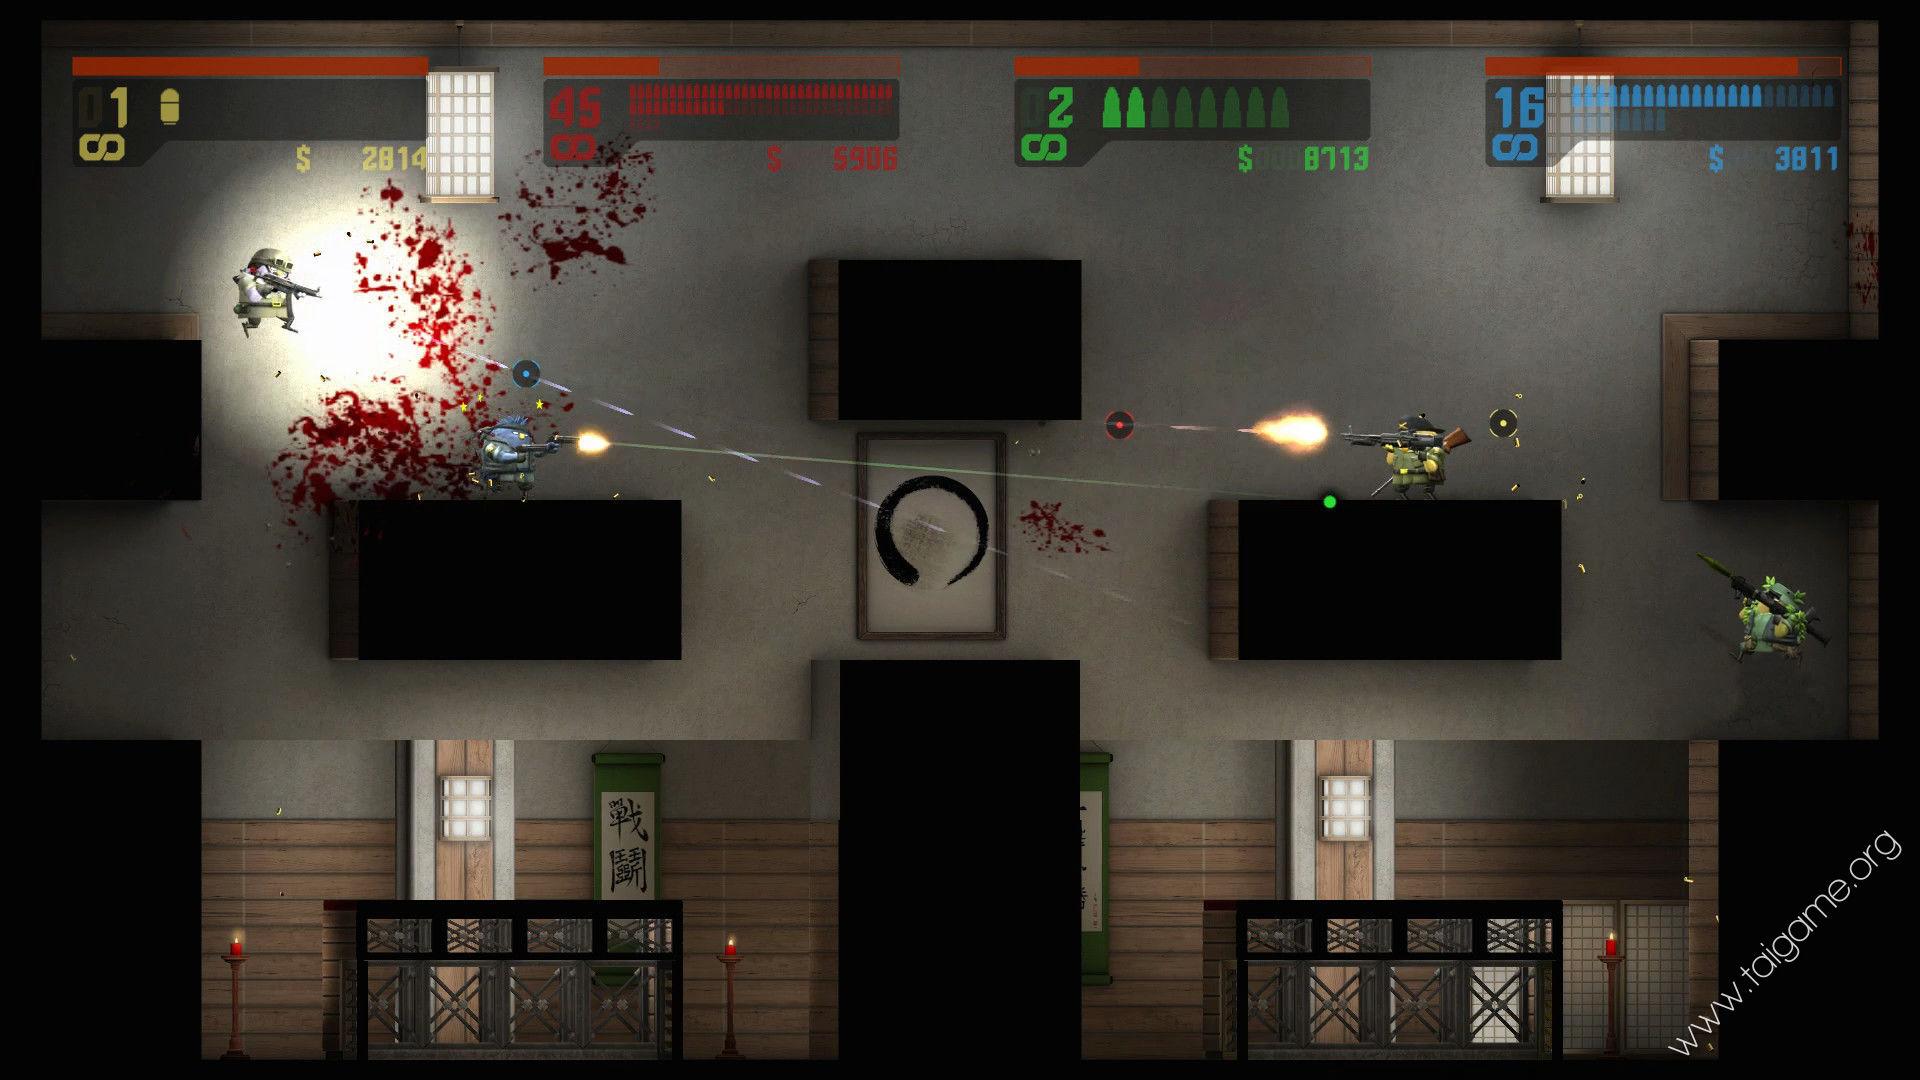 Commando Strike Force, modren Duty Action Call for iOS - Free Commandos : Strike Force for iOS, games Like Commandos, strike Force (En, Fr,Es) ROM (ISO) Download for Sony